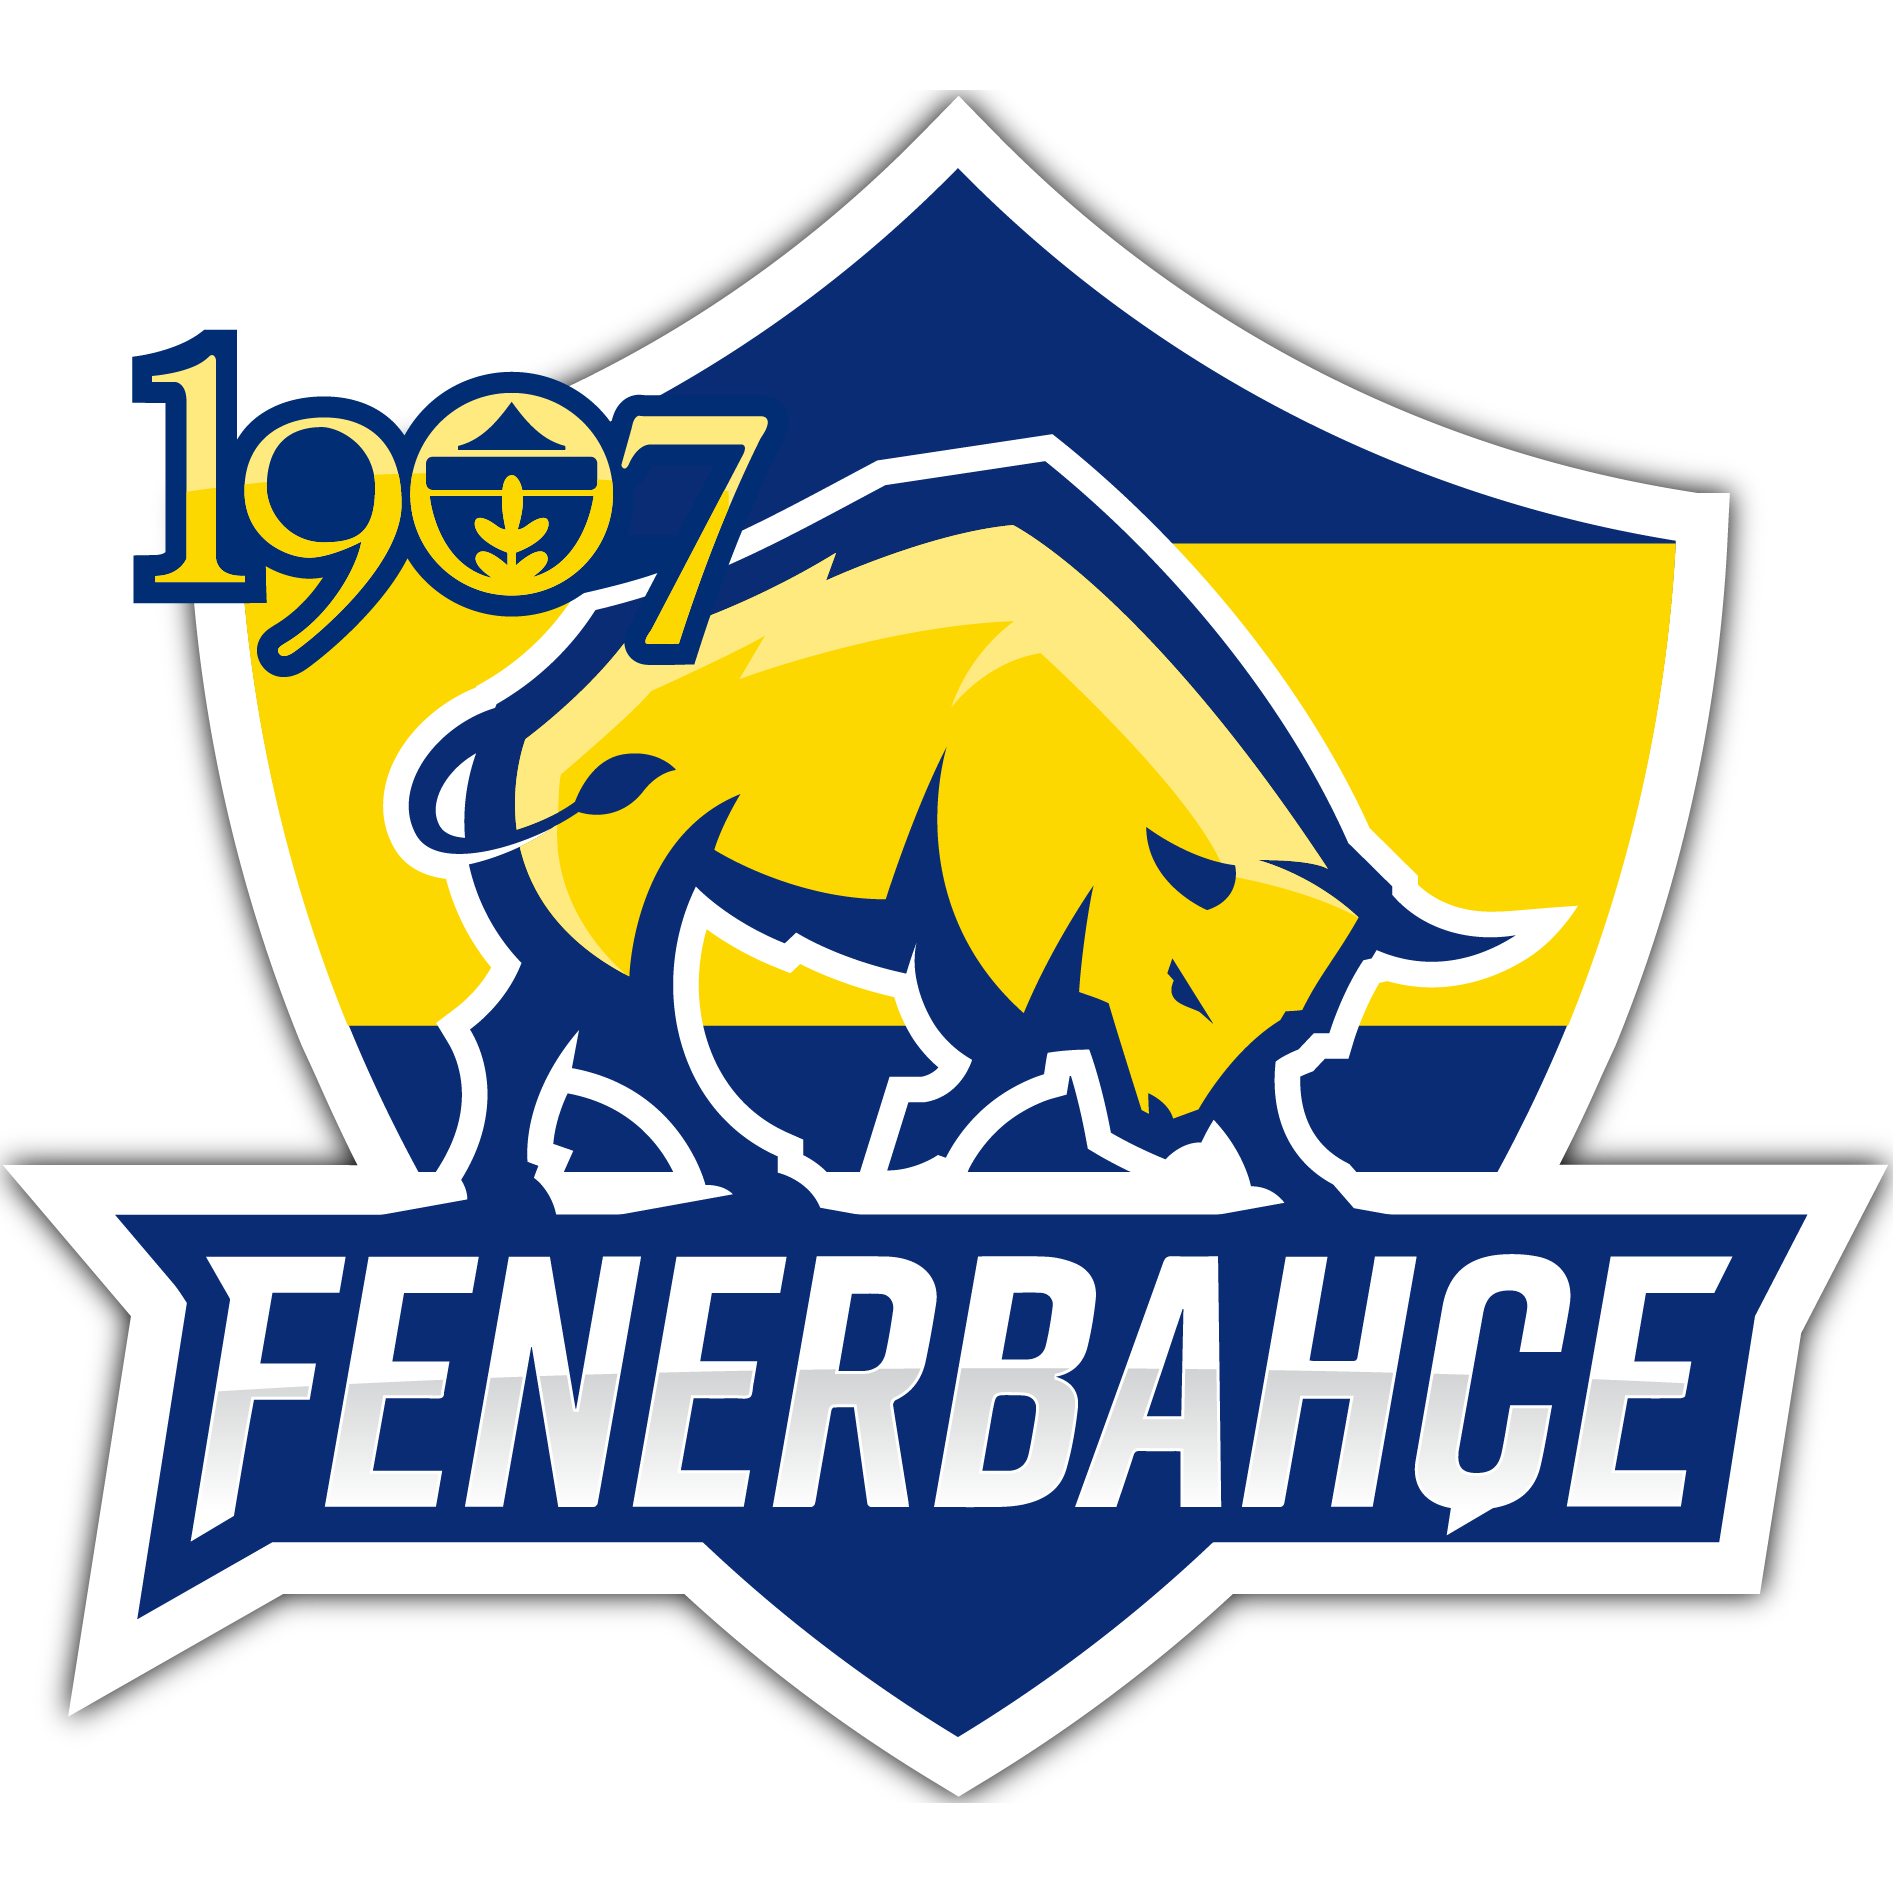 1907-fenerbahce